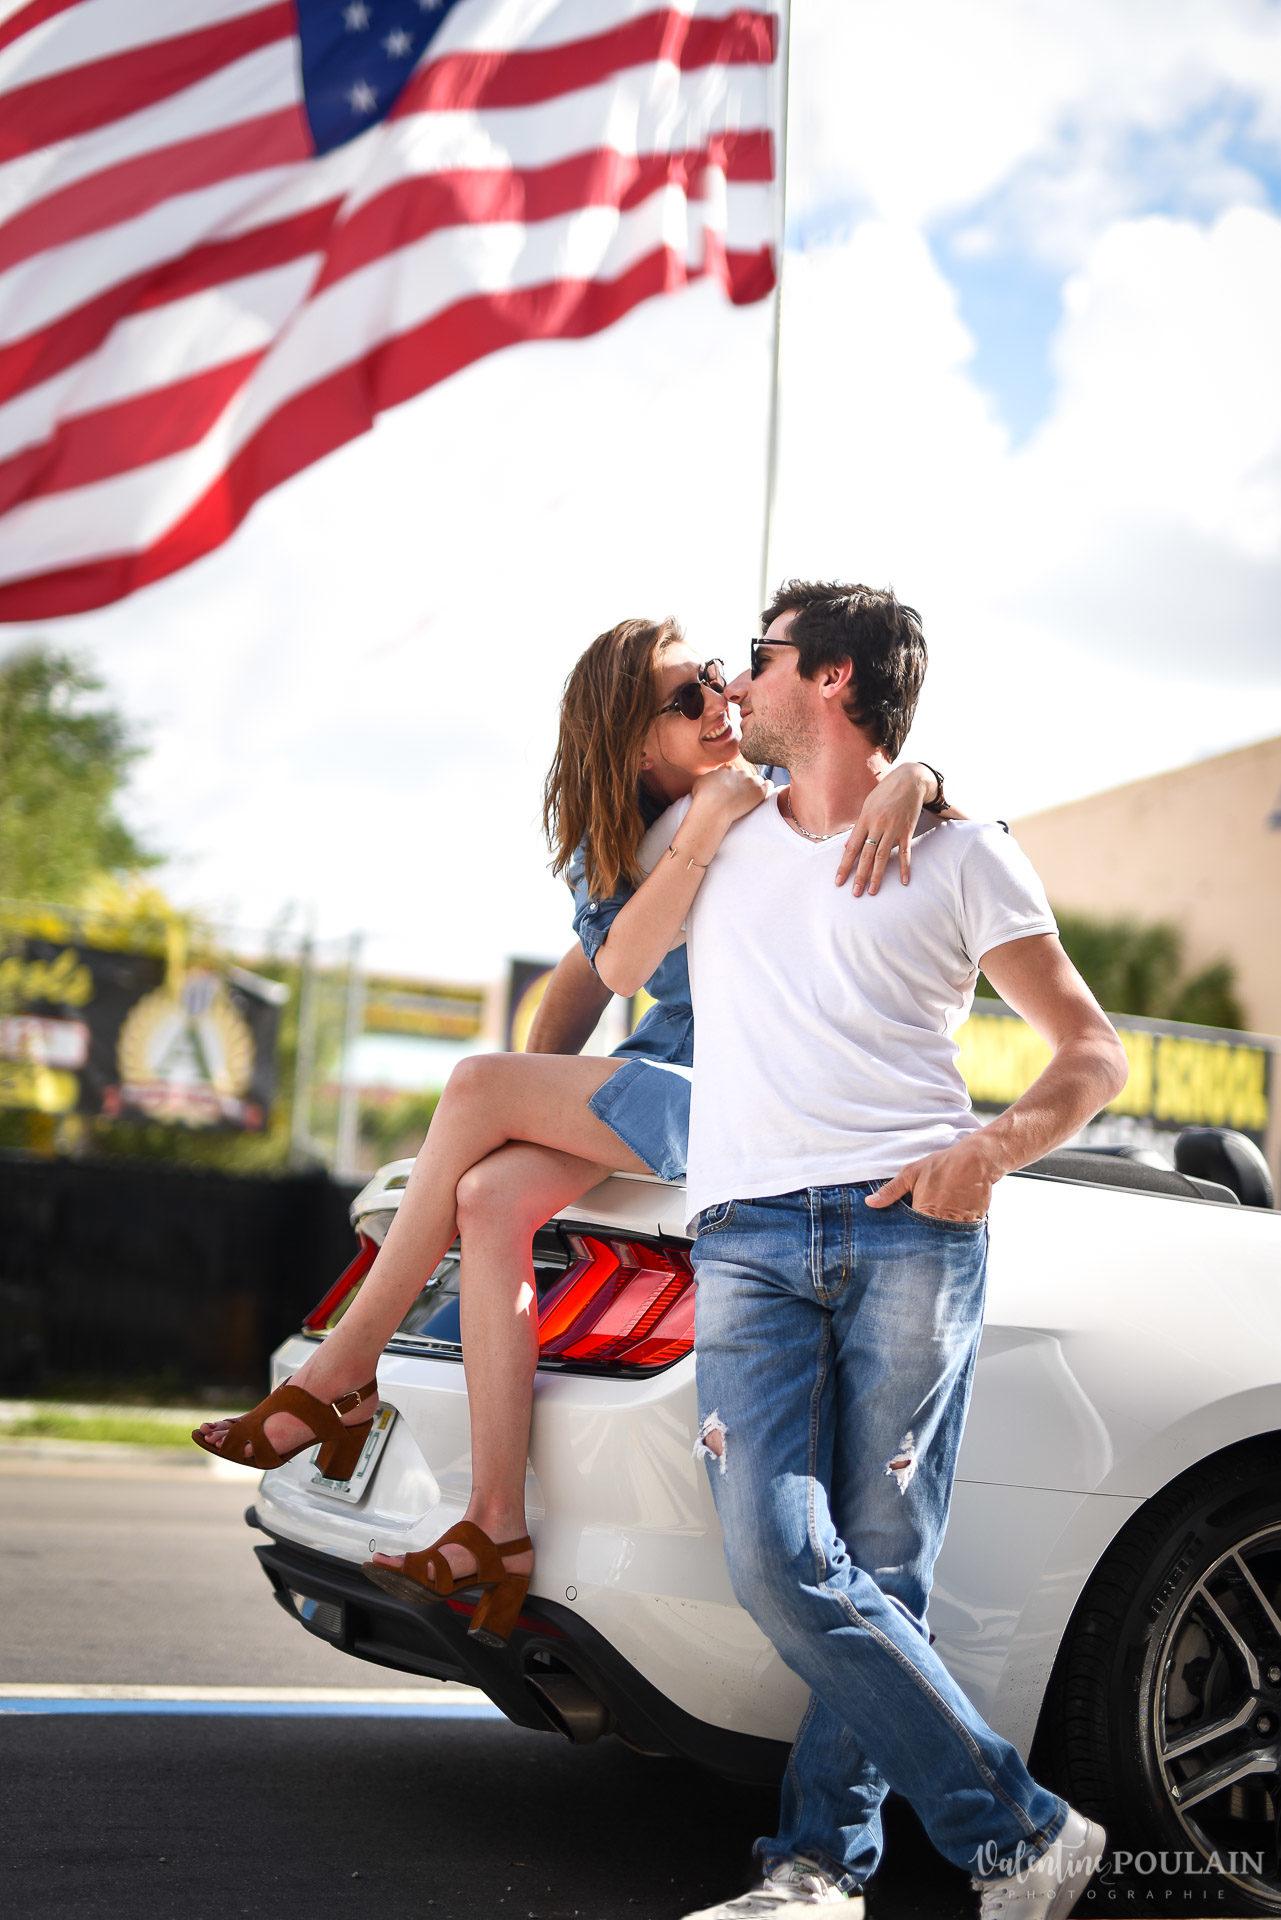 Couple Miami Wynwood - Valentine Poulain mustang